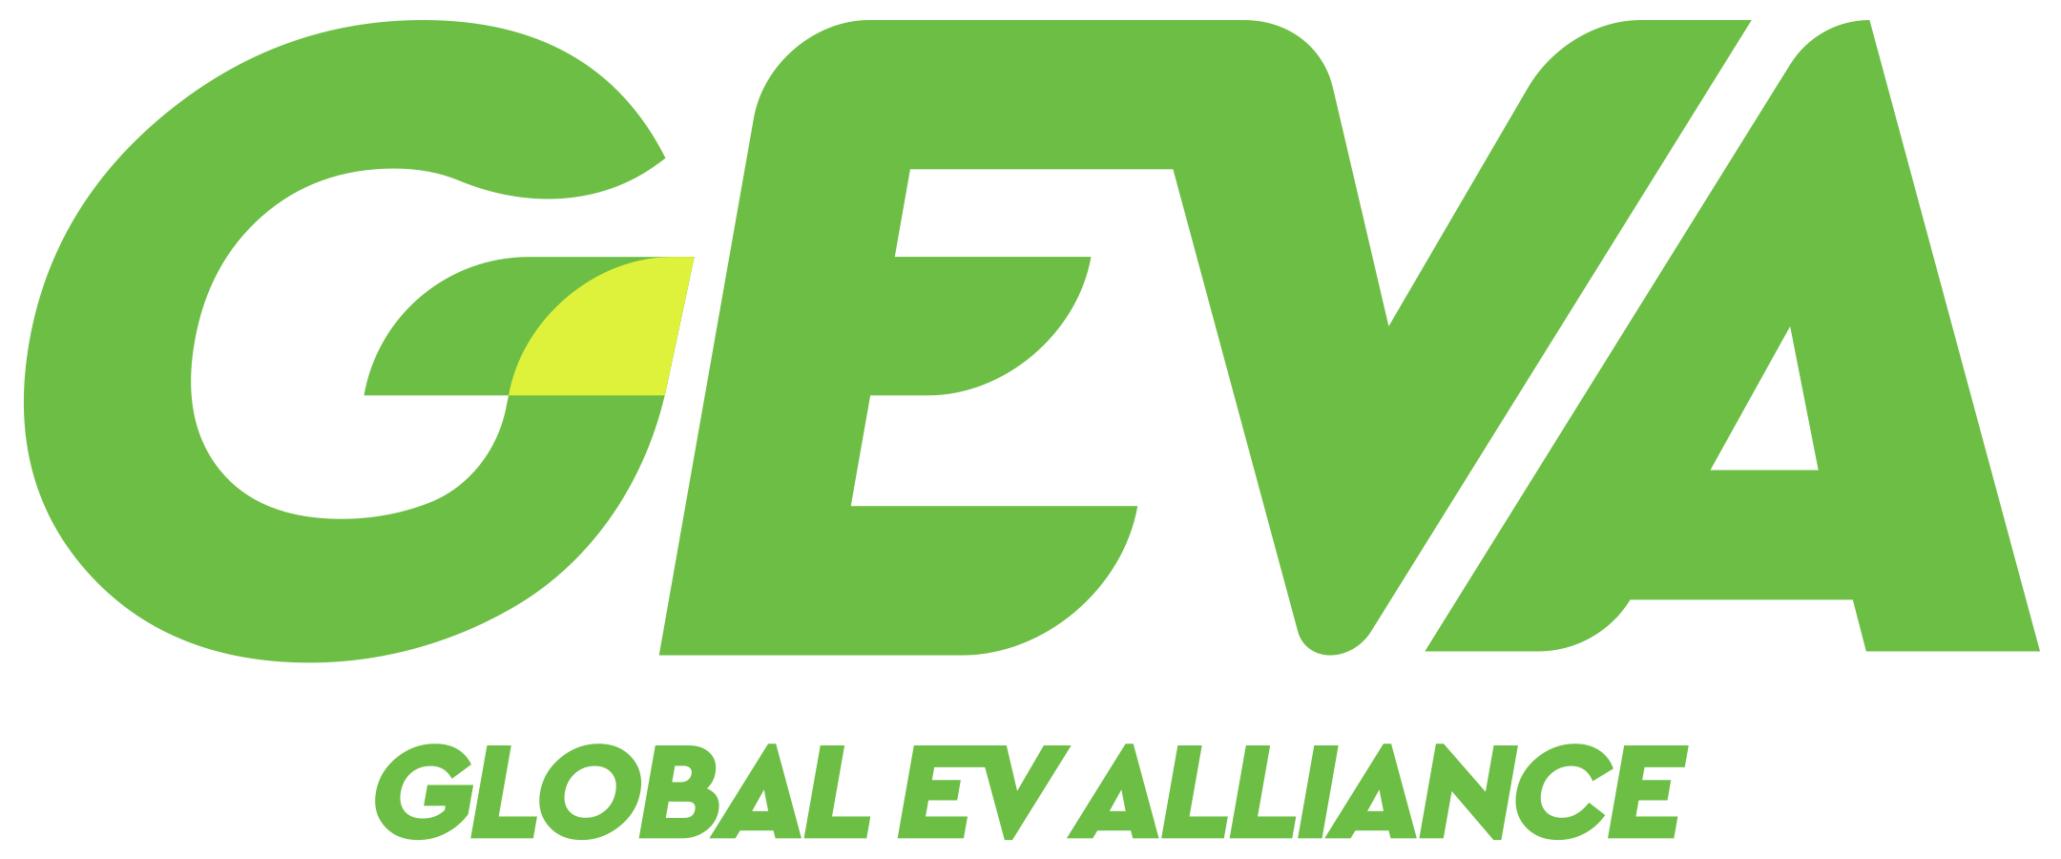 GEVA logo for press release